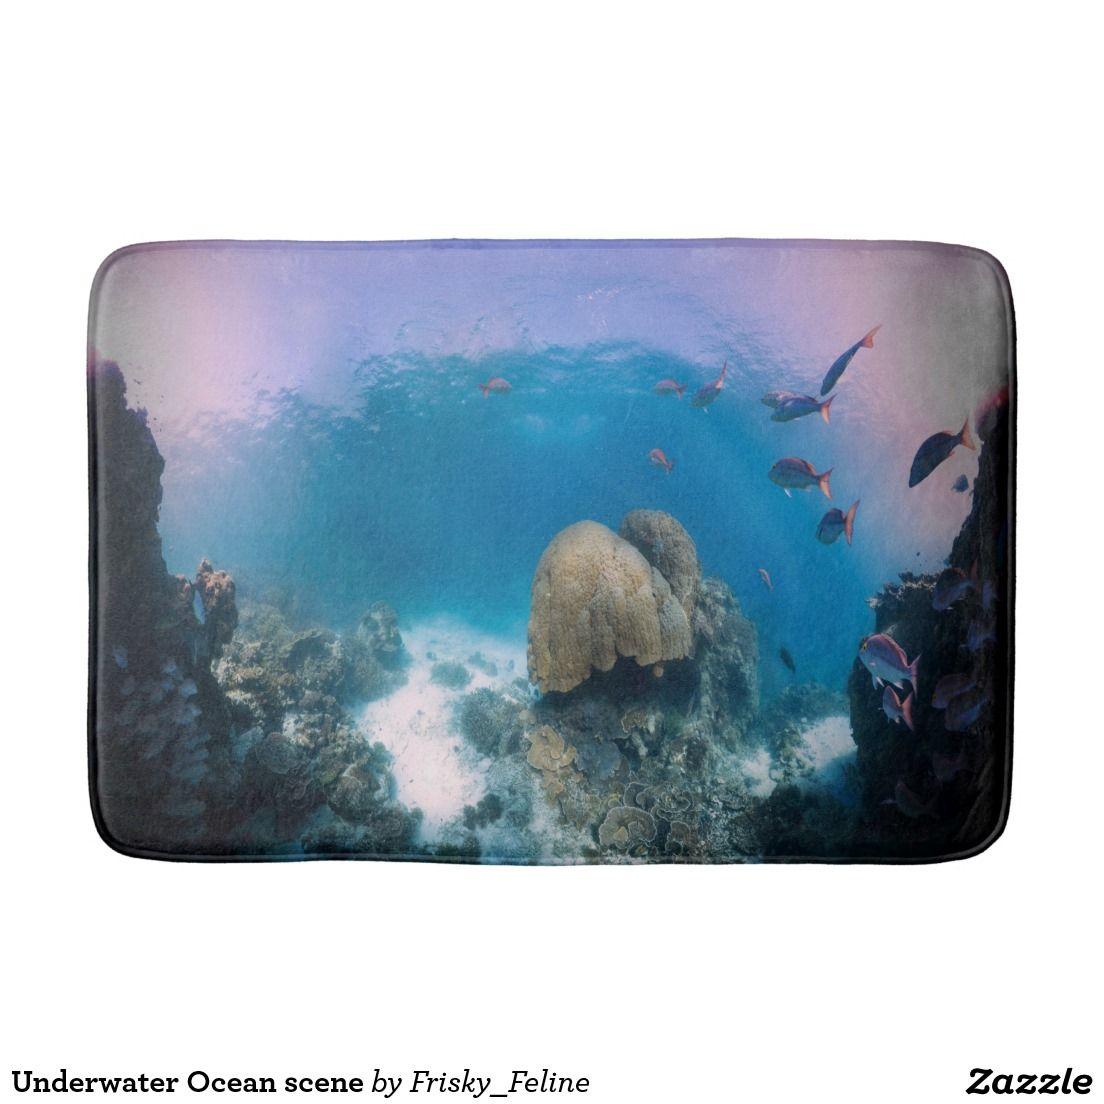 underwater ocean scene bath mat pillows blankets